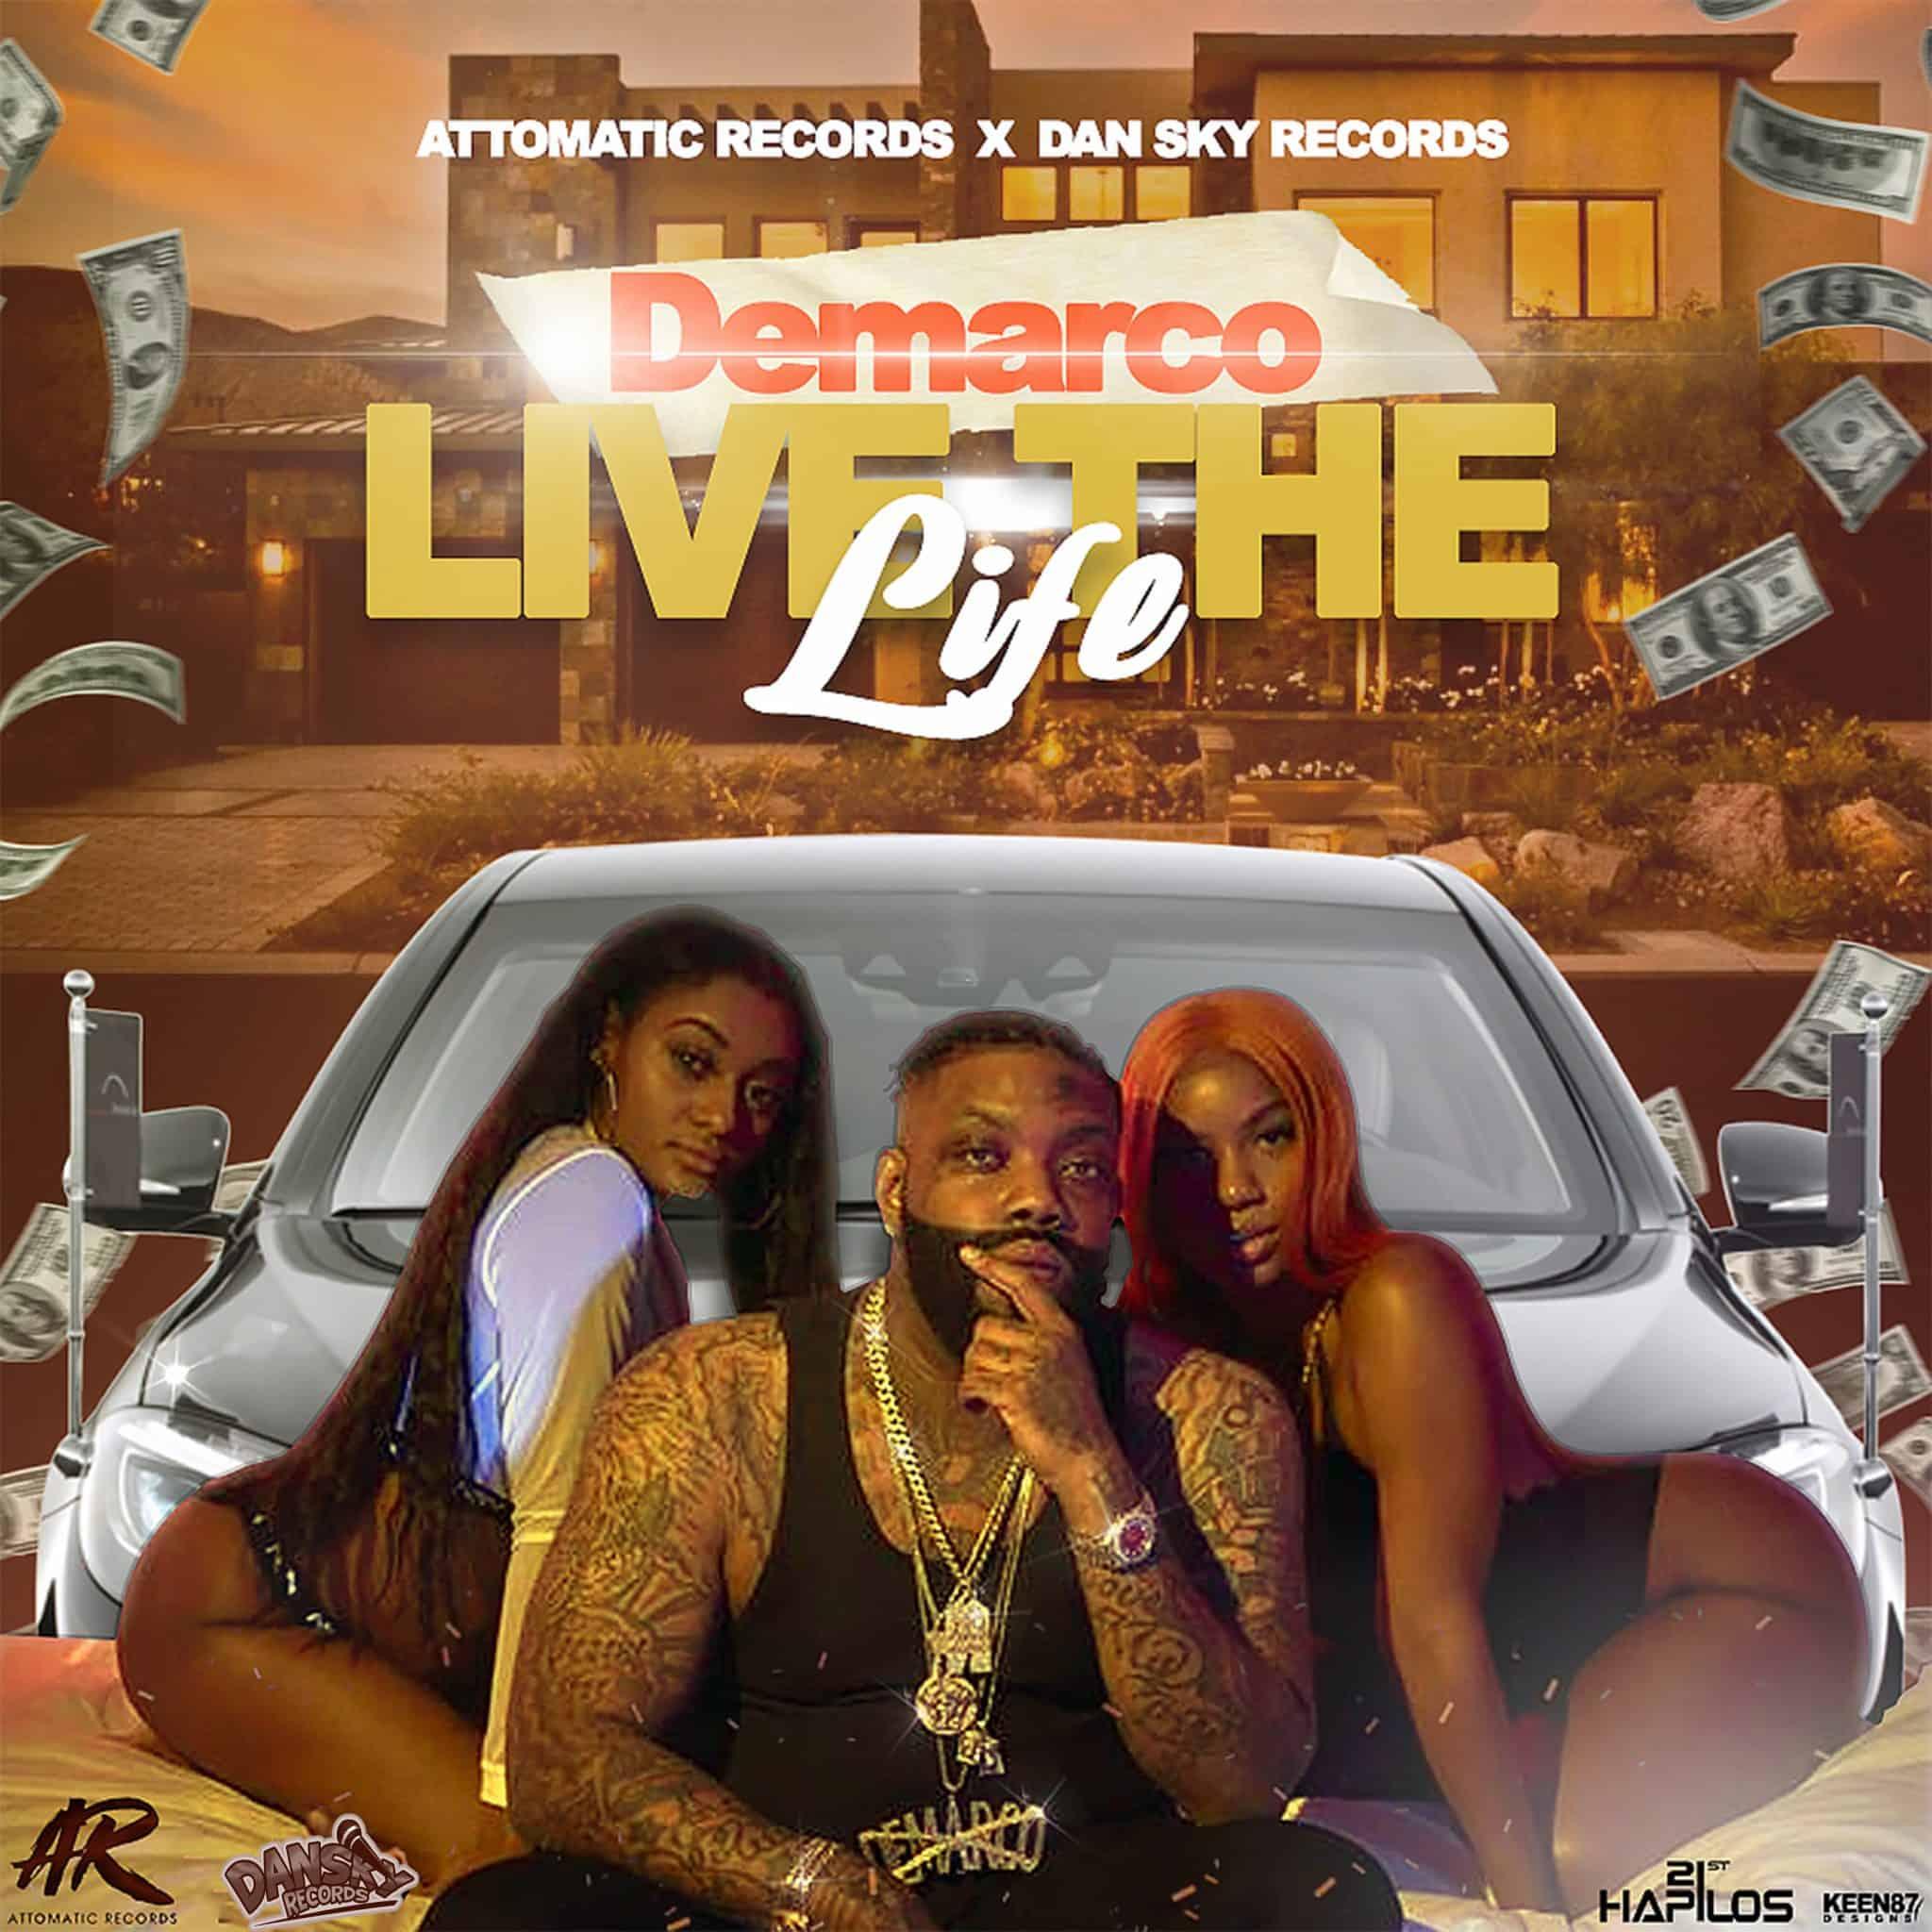 Demarco - Live The Life - Attomatic Records / Dan Sky Records